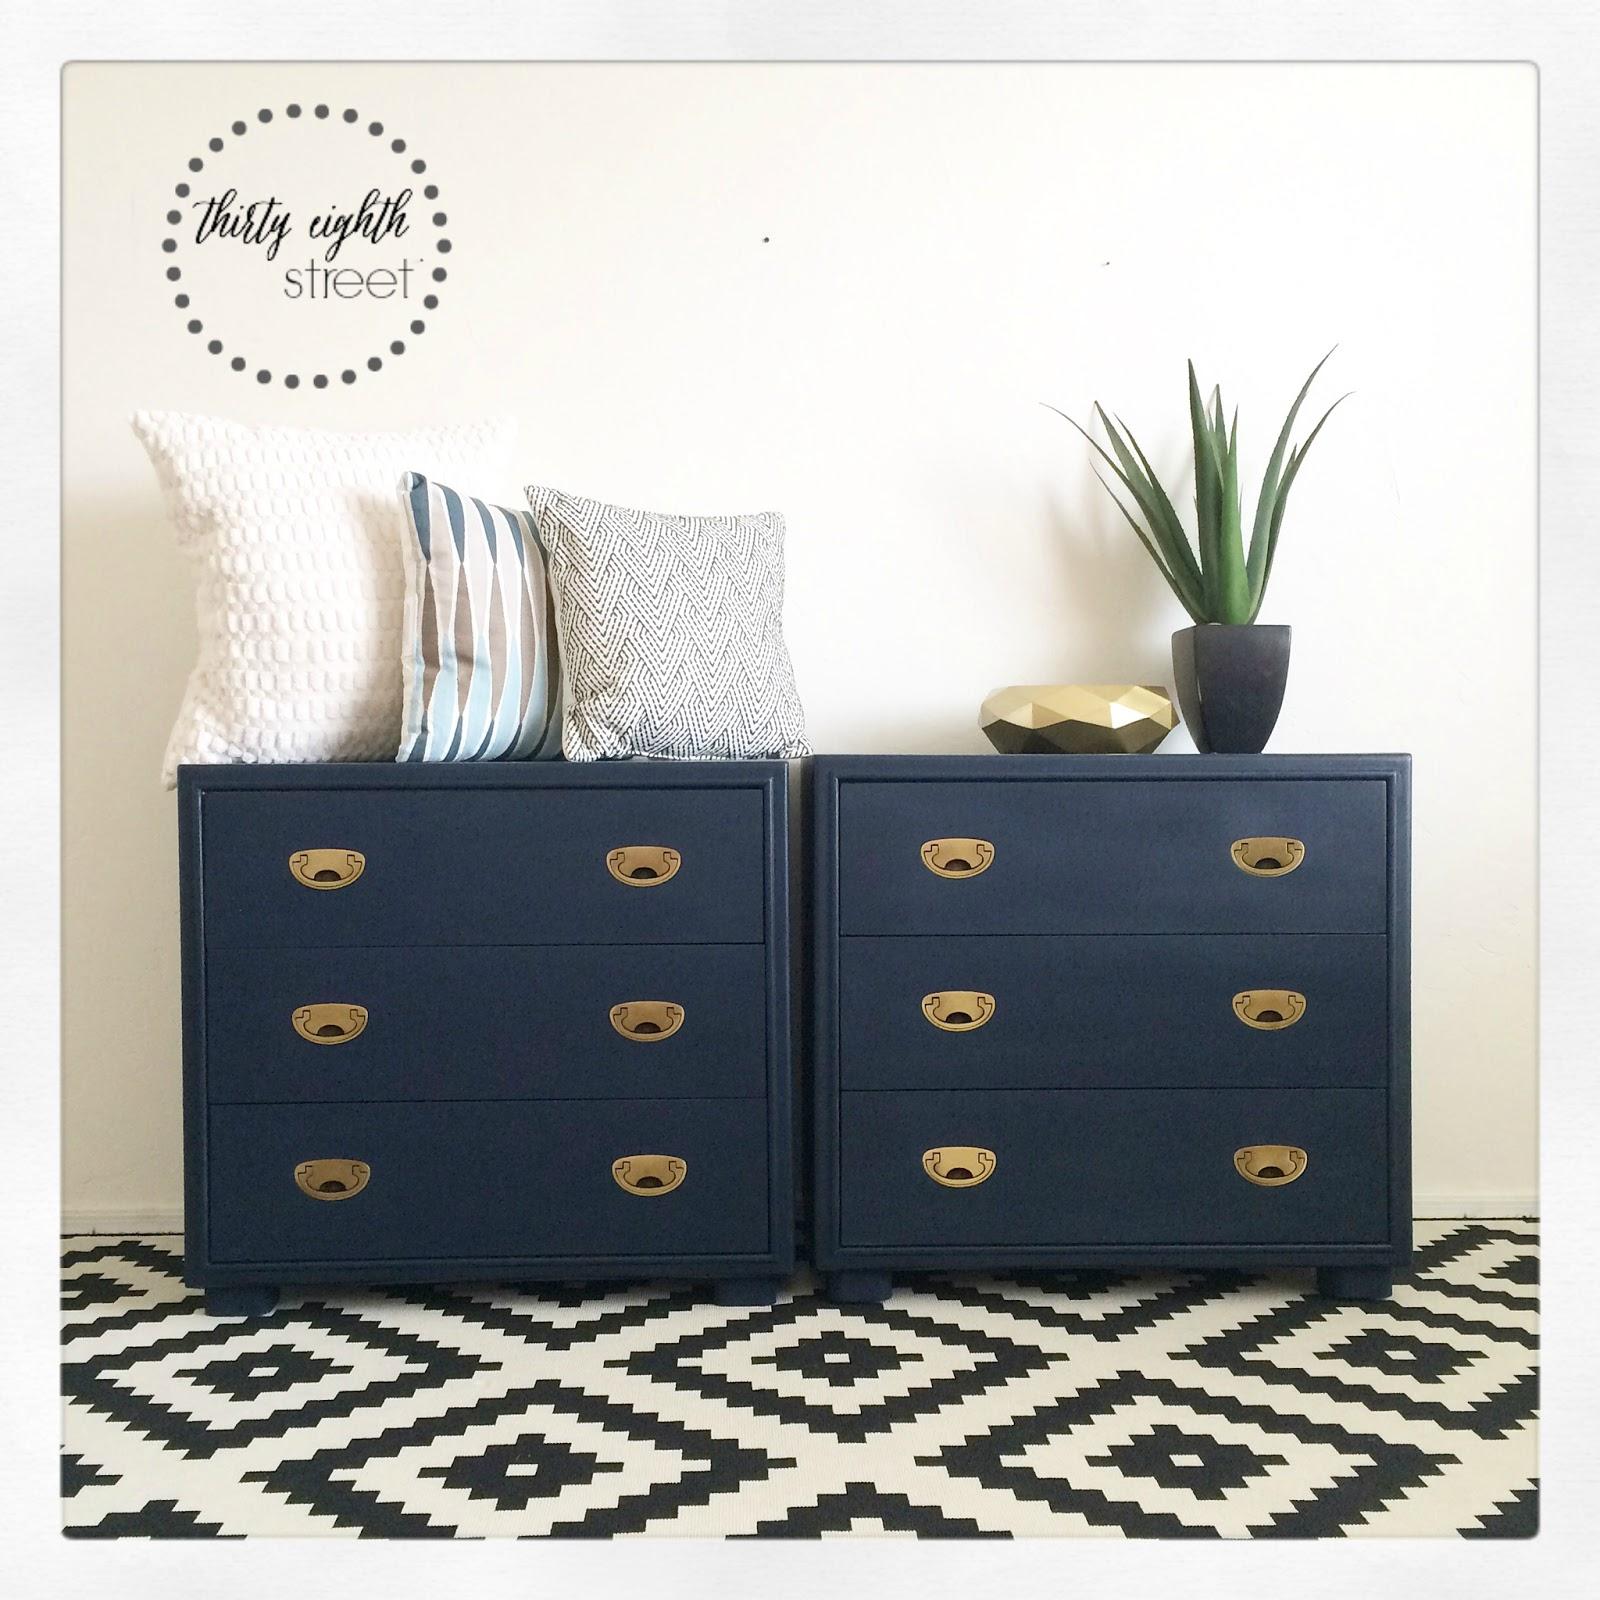 Navy Blue Dresser Bedroom Furniture 2016 Thirty Eighth Street